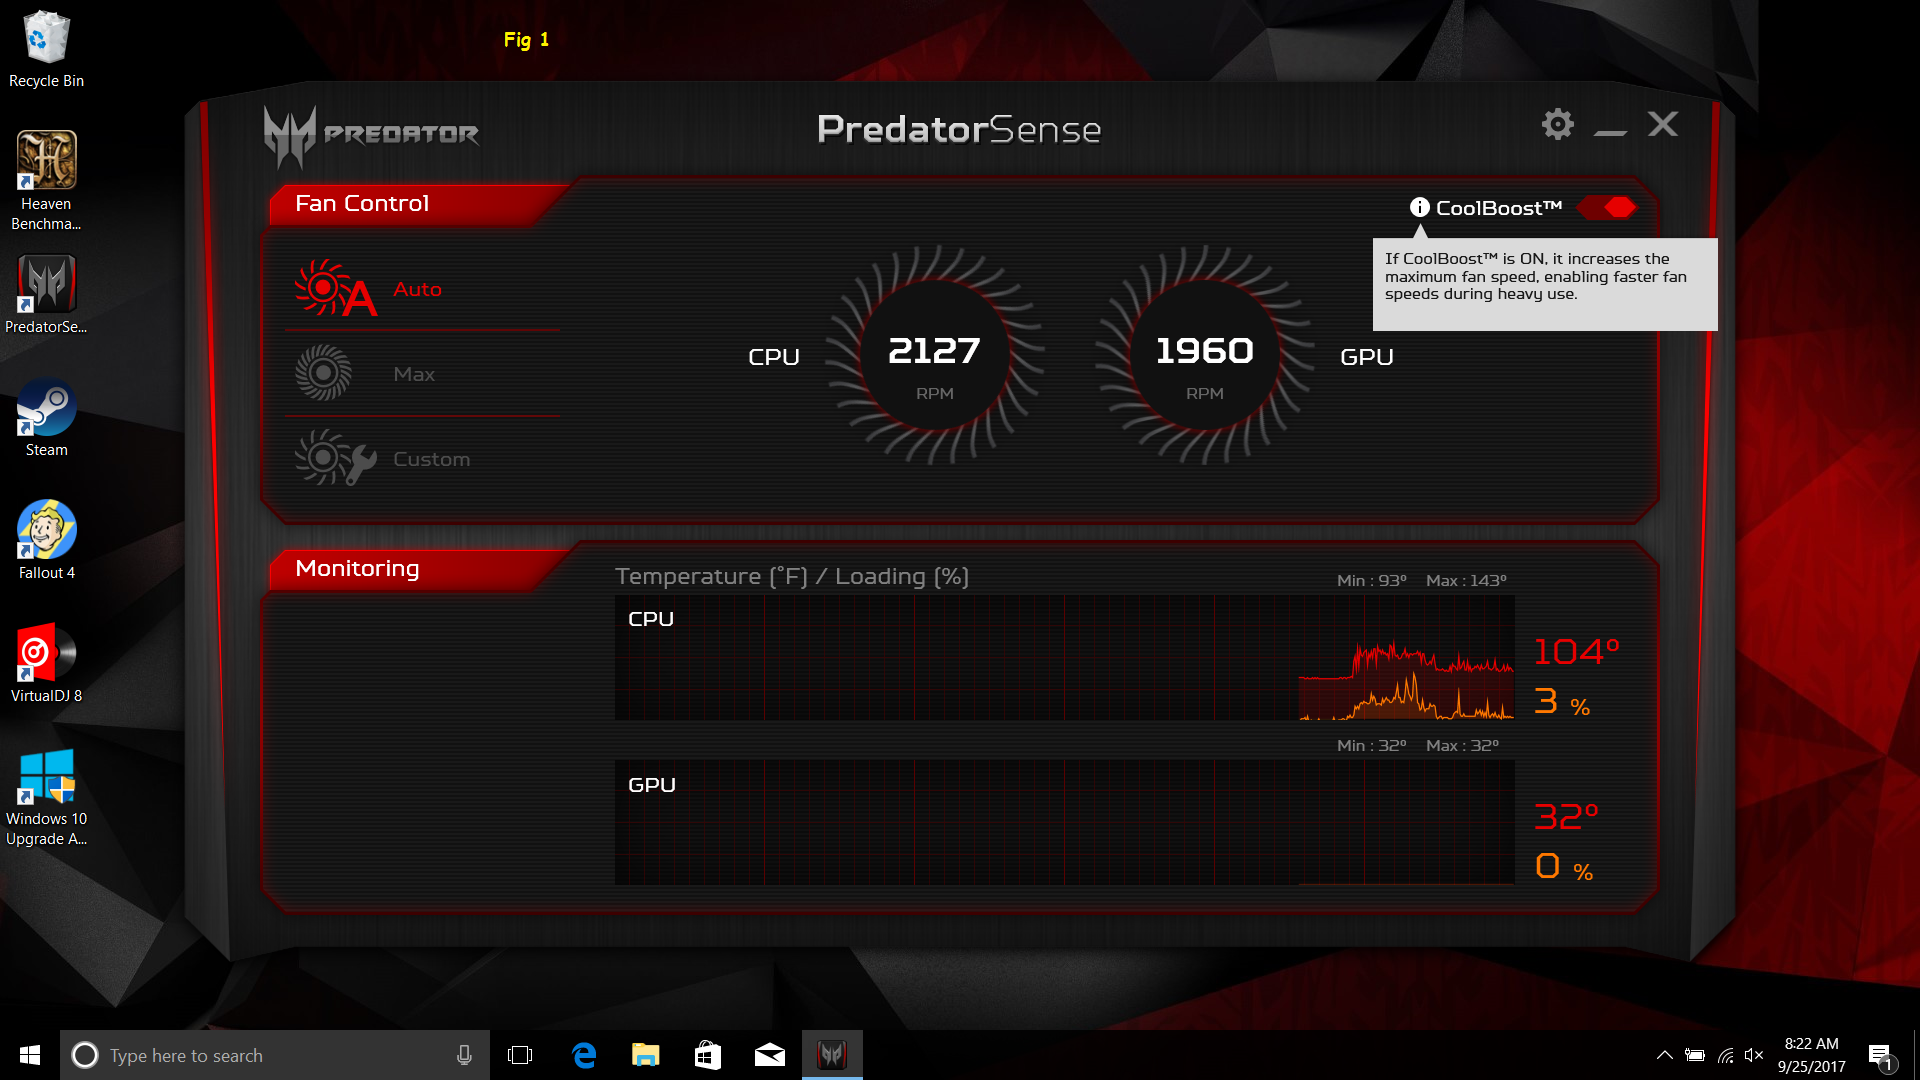 PredatorSense only has Fan Control Options — Acer Community